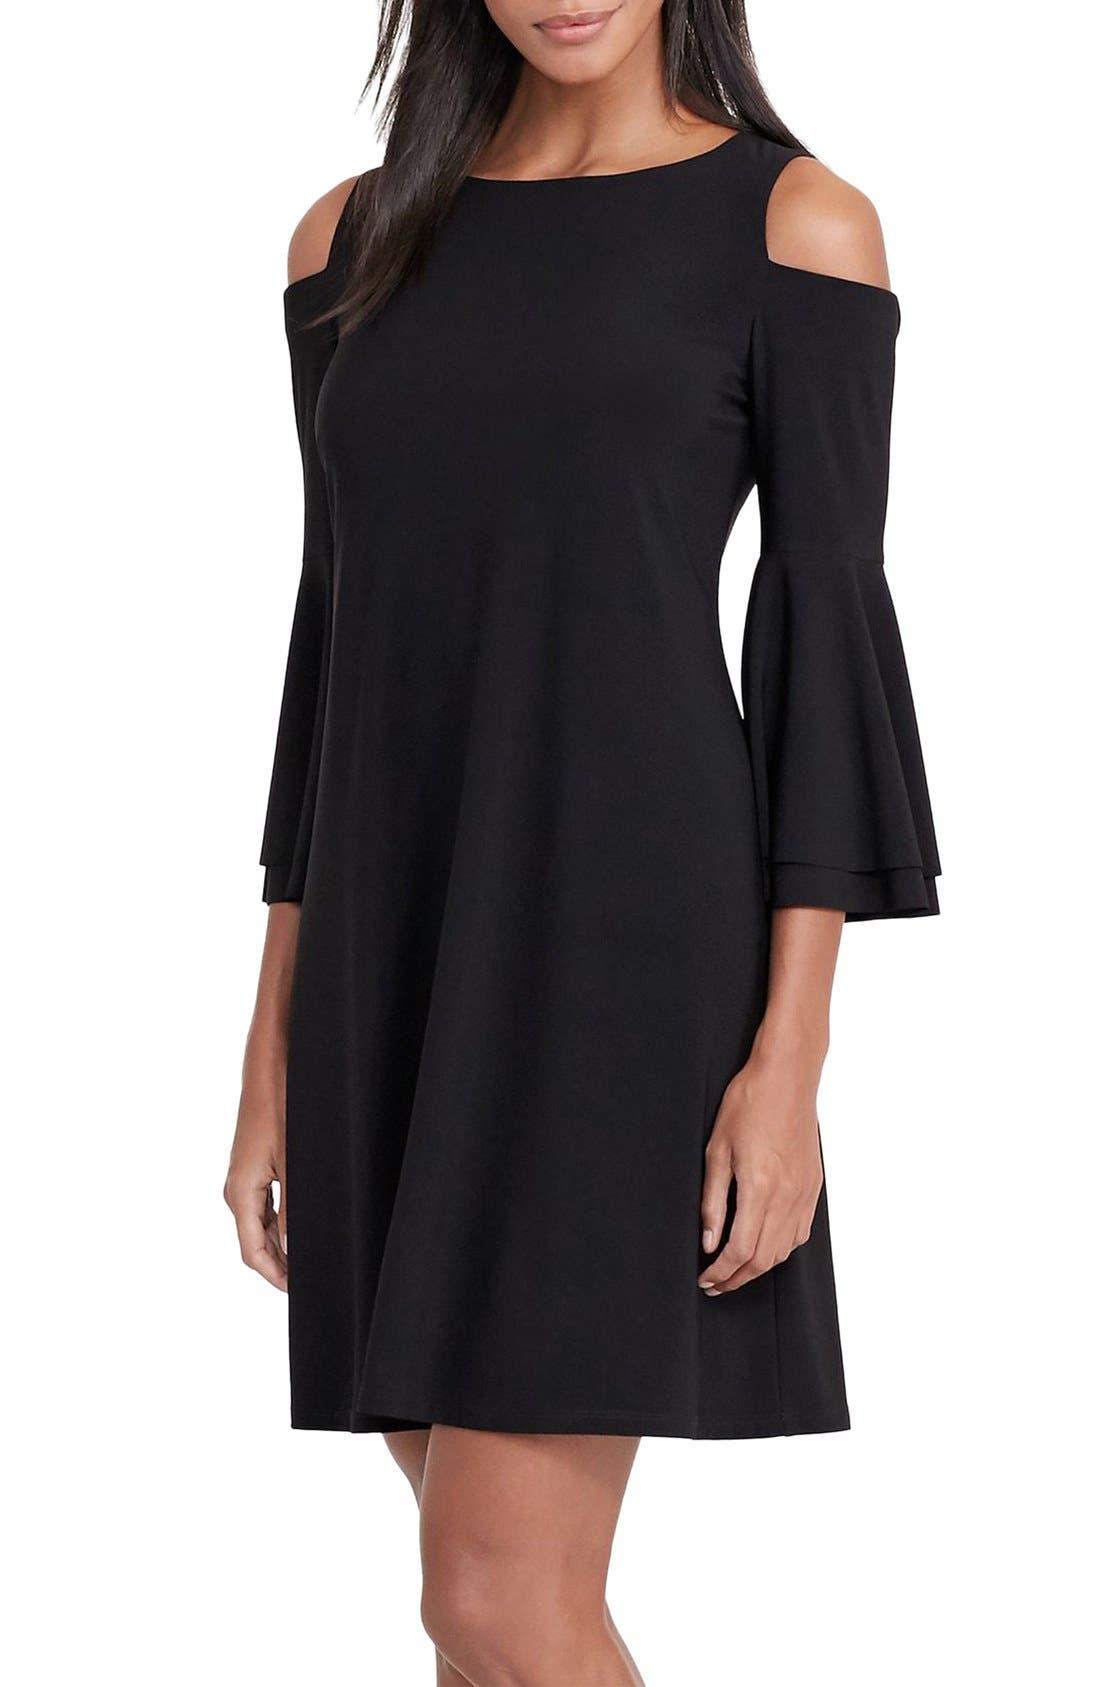 Alternate Image 1 Selected - Lauren Ralph Lauren Cold Shoulder Jersey A-Line Dress